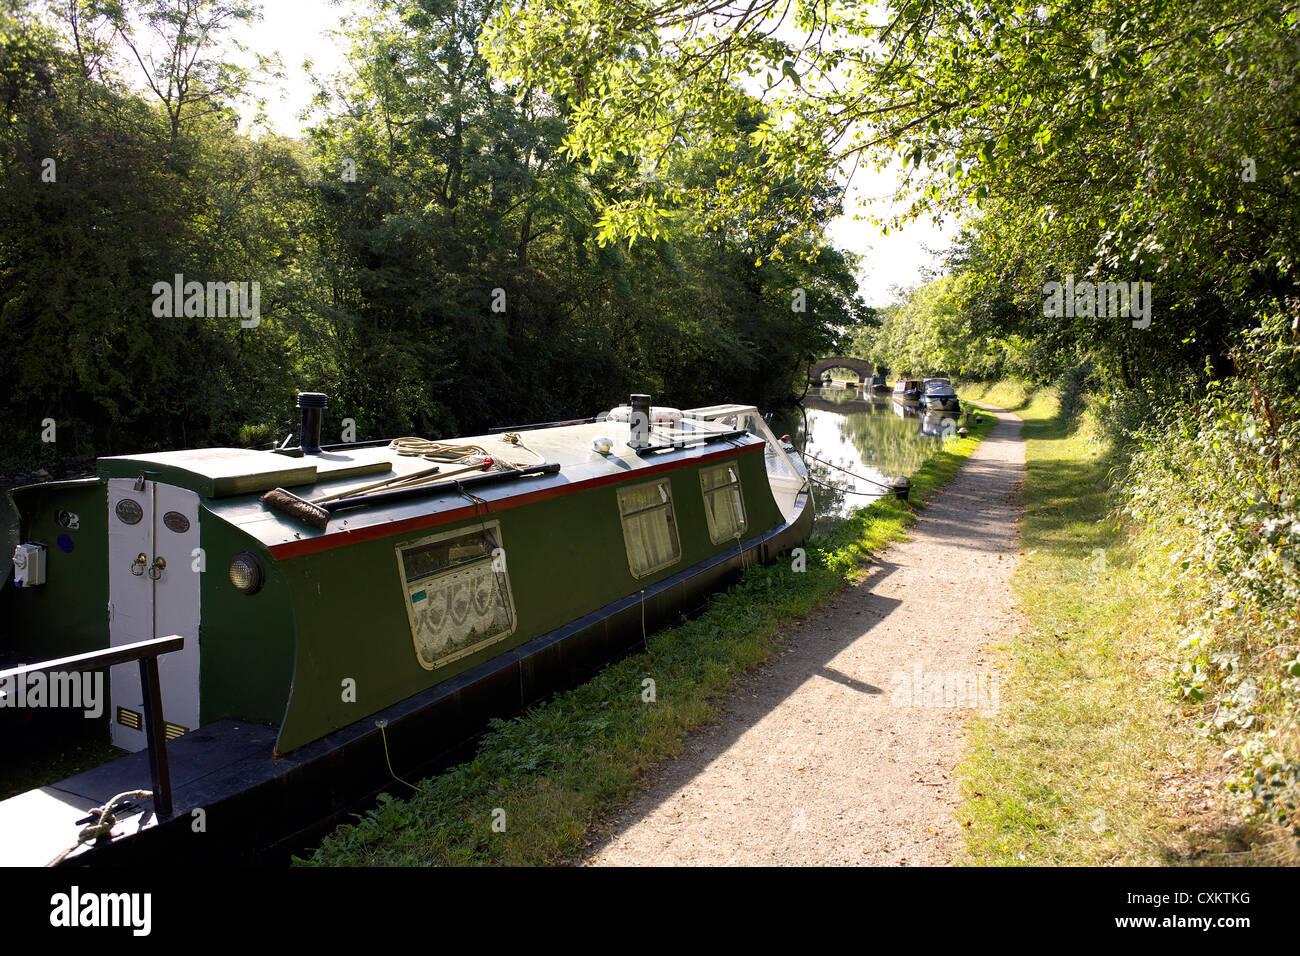 Narrowboats on the Grand Union Canal, Warwickshire, UK, England, GB, British, English, inland, waterways, canals, - Stock Image